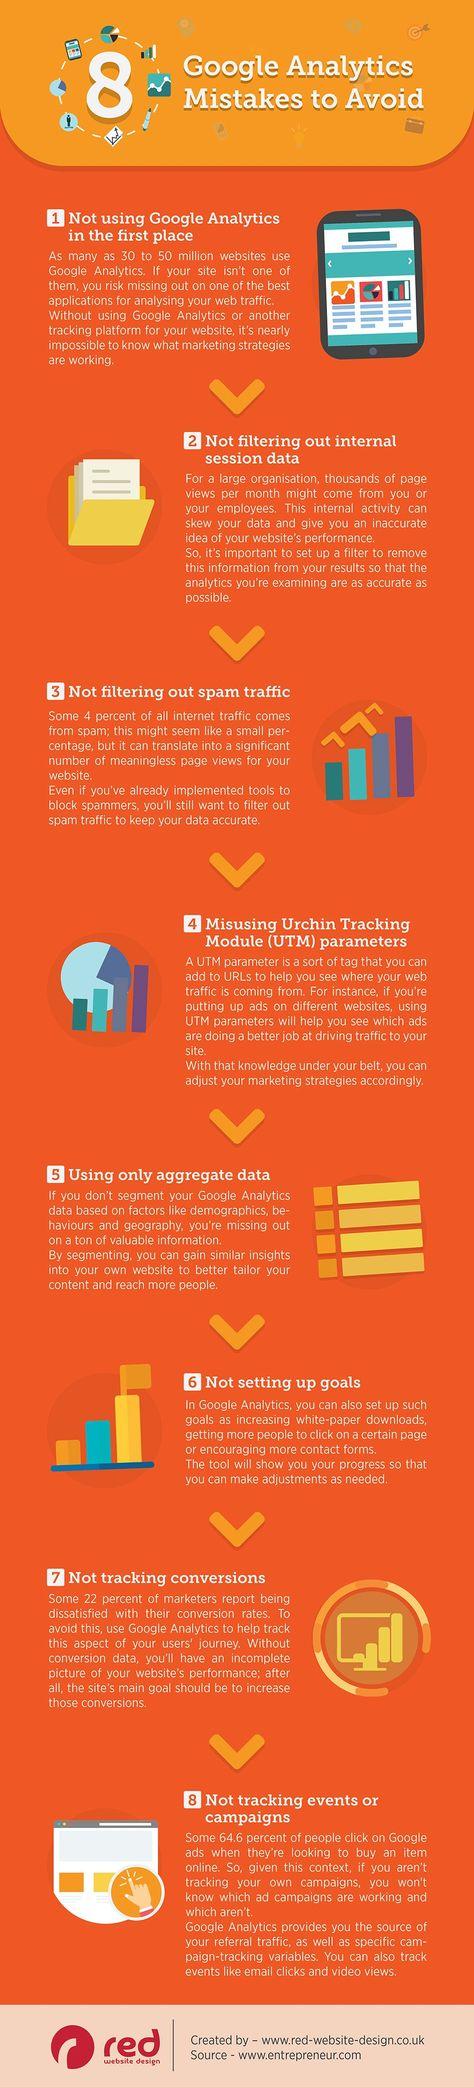 8 Google Analytics Mistakes to Avoid [Infographic]